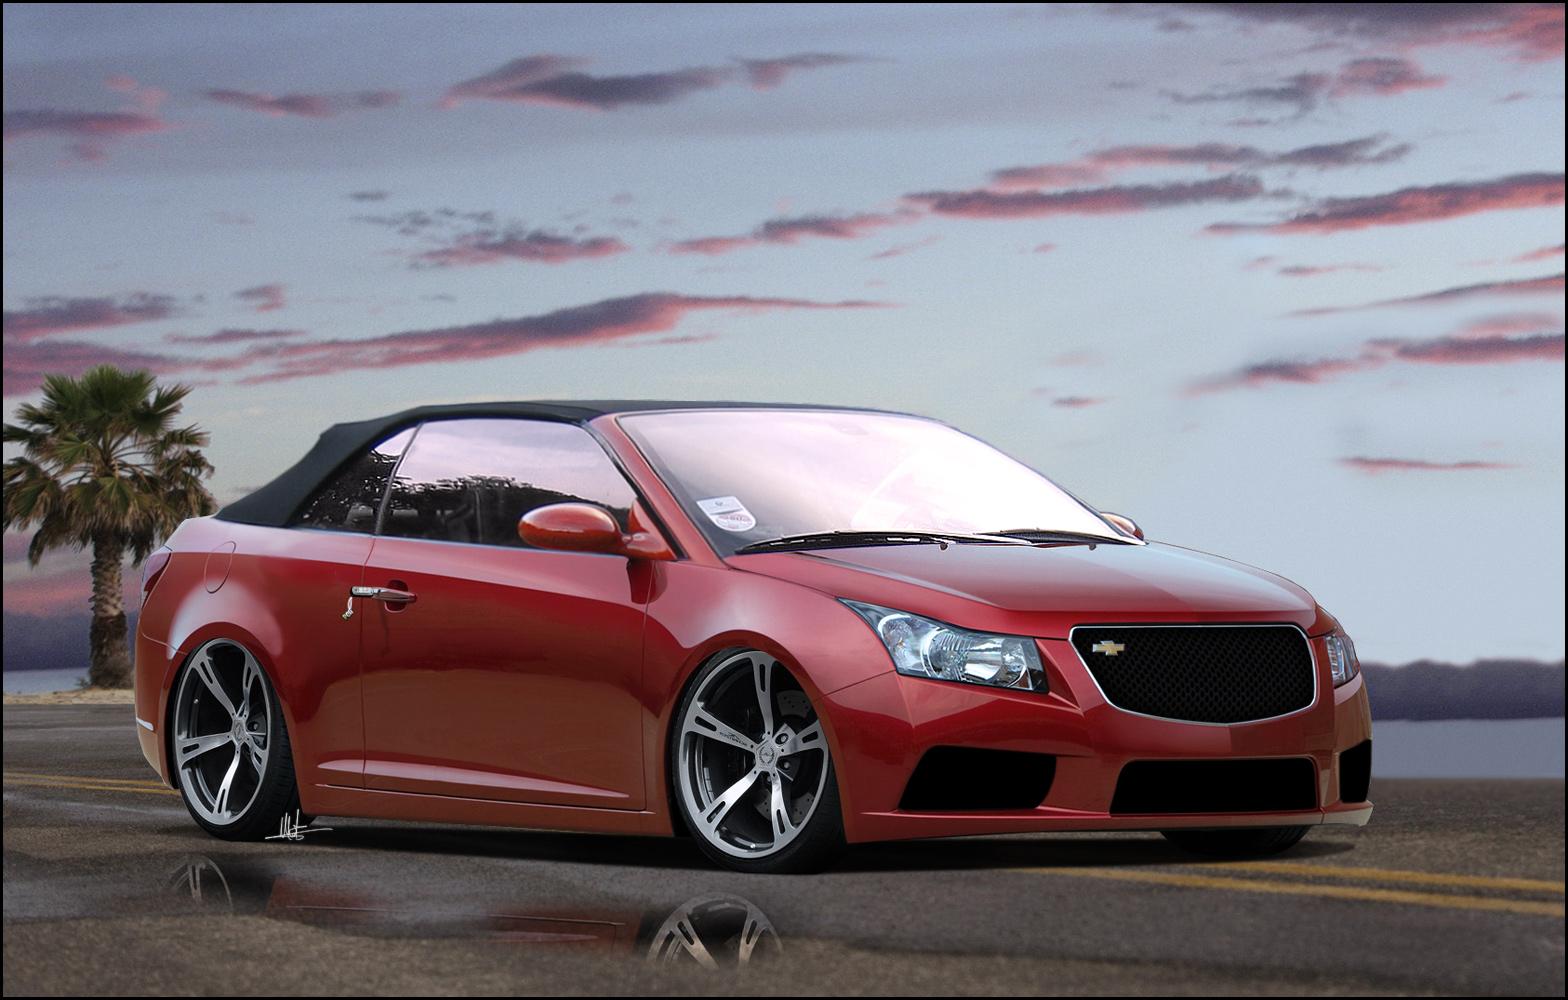 Acura Of Turnersville >> Pellegrino Chevrolet In Westville Turnersville Chevrolet   Autos Post